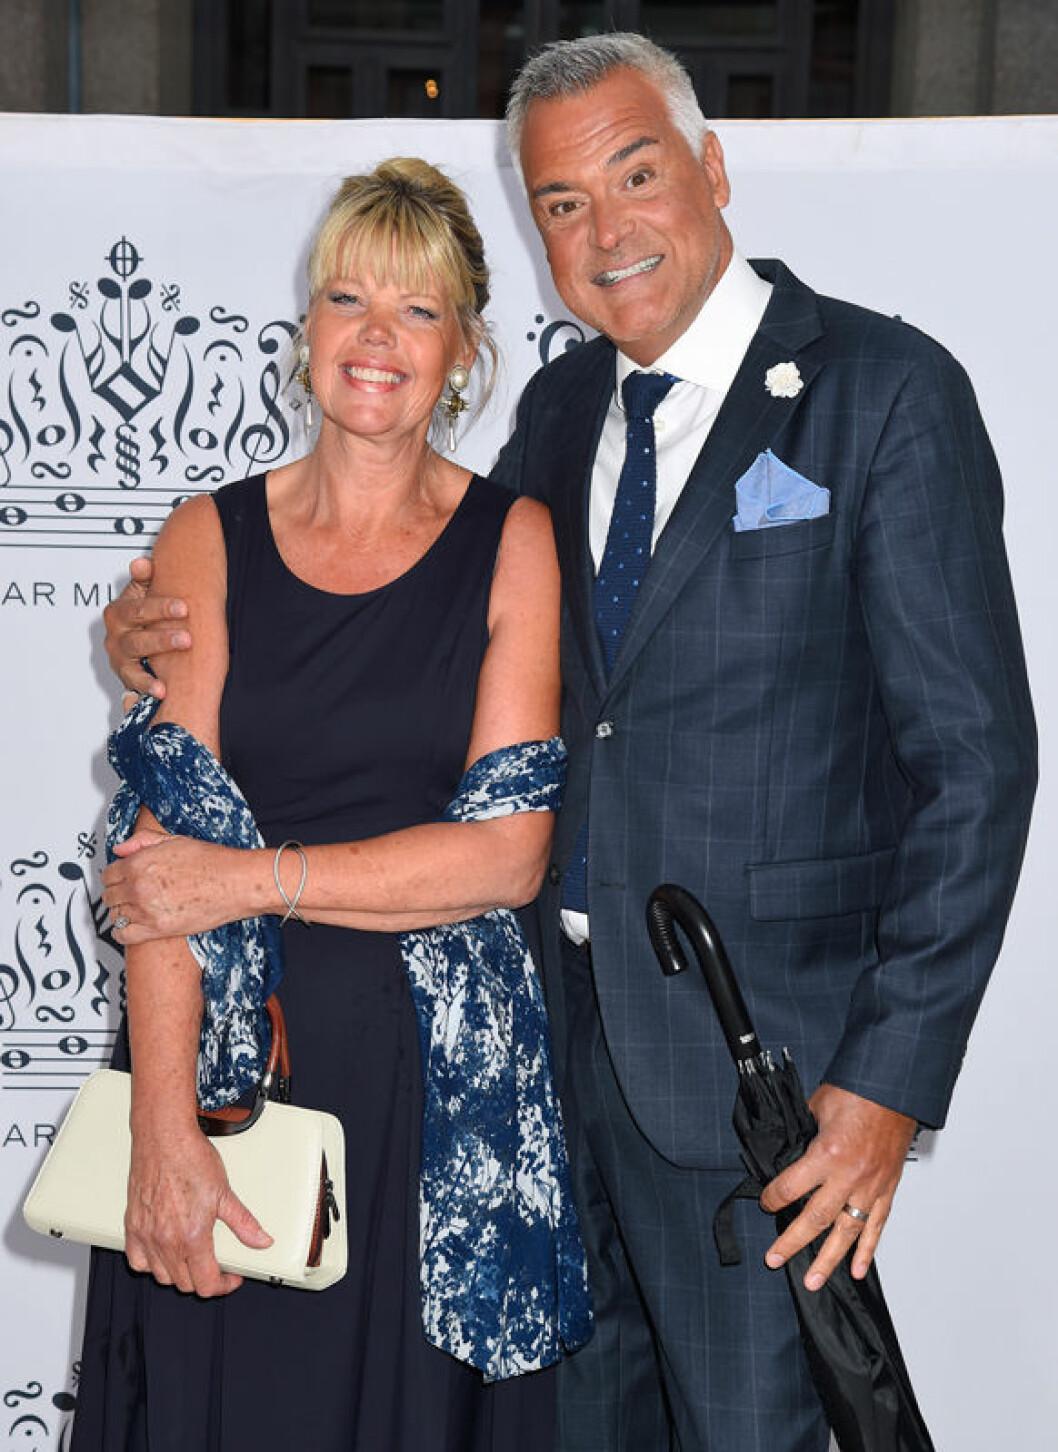 Ernst Kirchsteiger och frun Ulla Kirchsteiger på röda mattan inför The Polar Music Prize i Stockholm Concert Hall 2016.